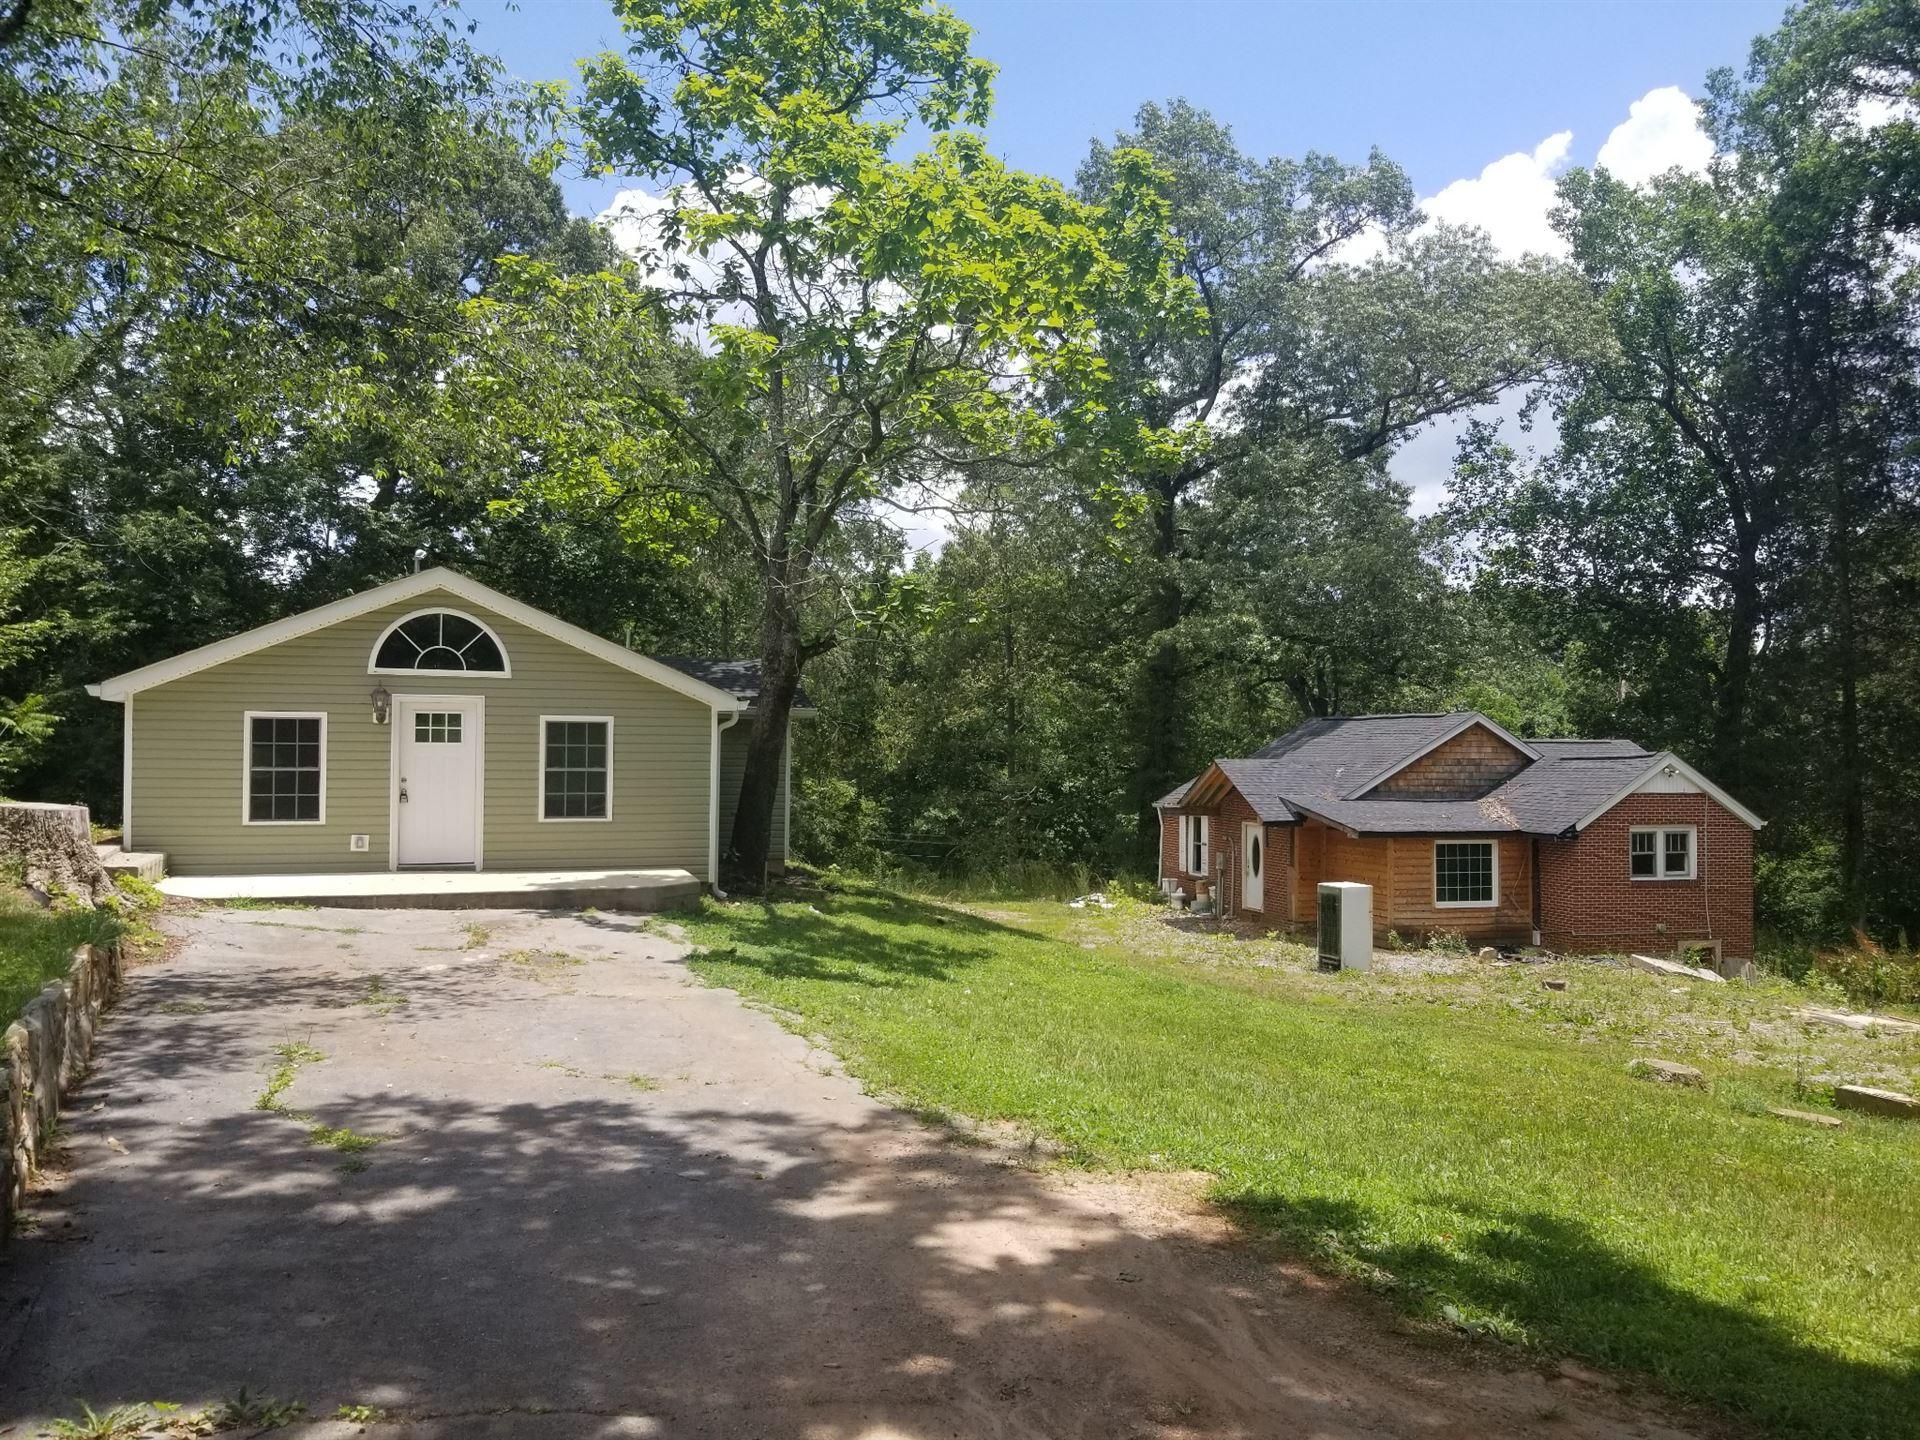 205 Shady Rest Rd, McMinnville, TN 37110 - MLS#: 2247734